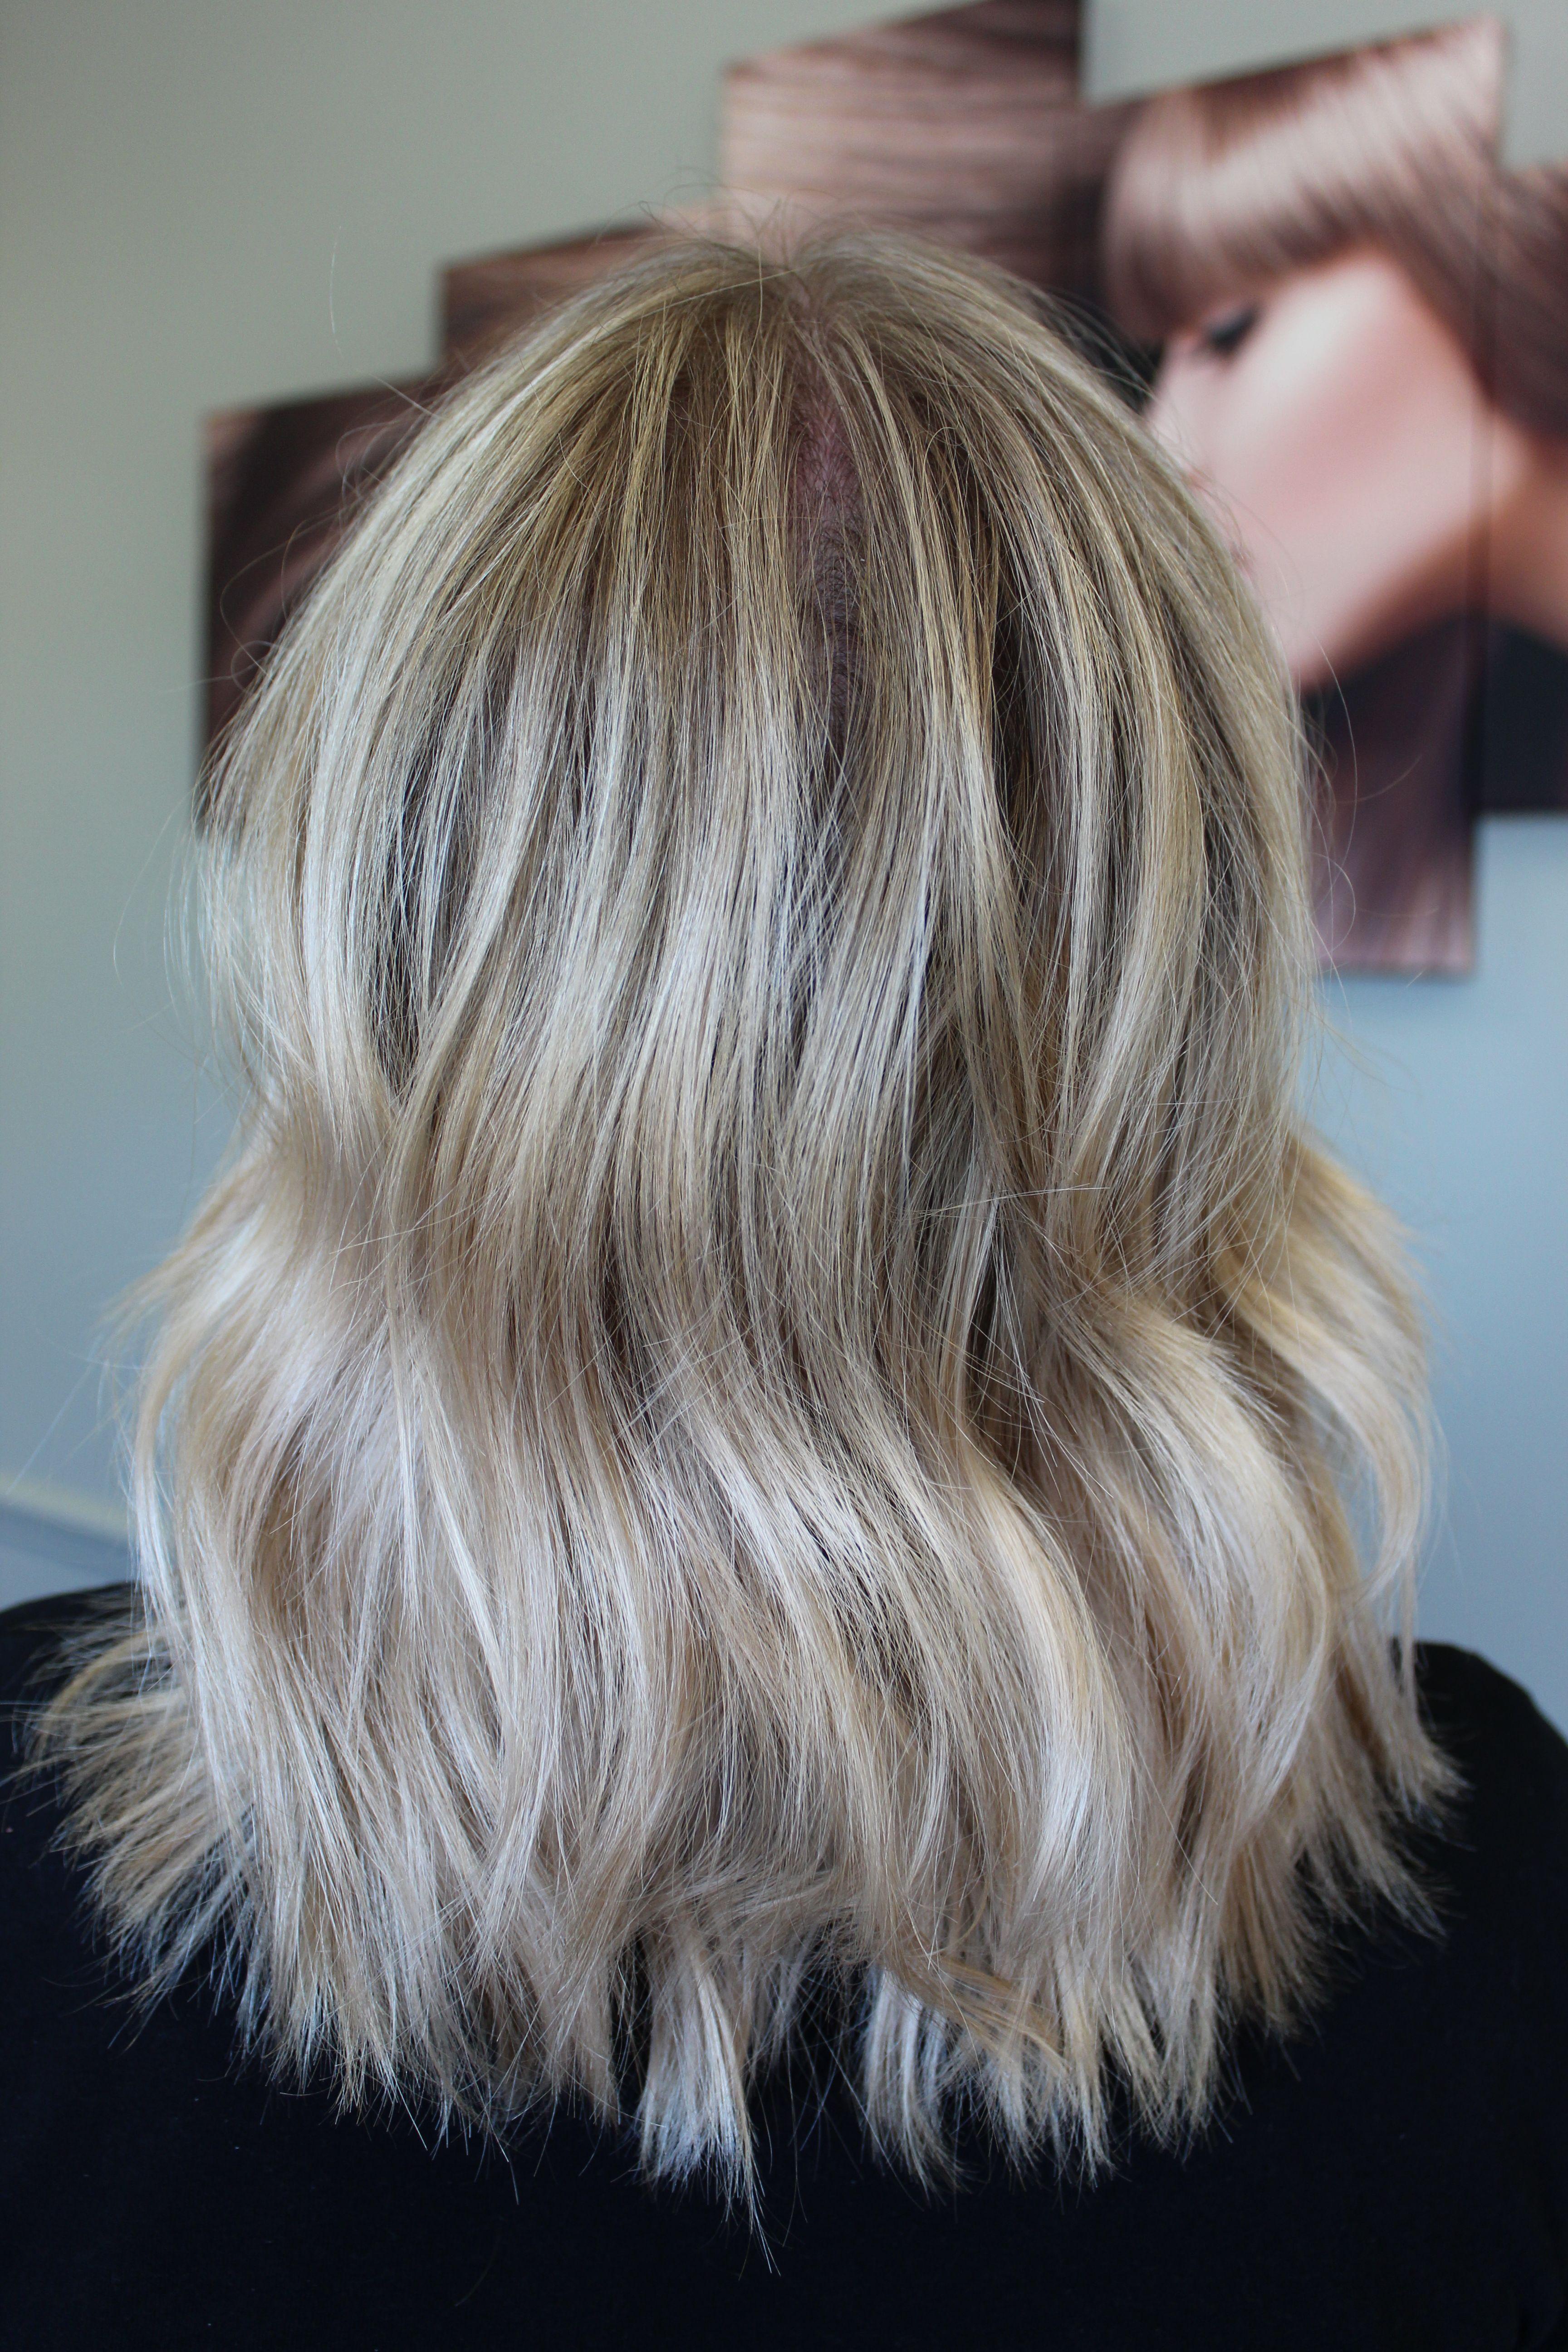 Ash Blonde with Shadow Root Textured Bob for Medium Length Fine Hair by Kay Stelzer @kaystelzerdidmyhair on Instagram. #fashion #blondebob #blondehair #ashblonde #texturedbob #mediumlengthhair #mediumbob #finehaif #platinumblonde #shadowroot #livedinhair #livedinblonde